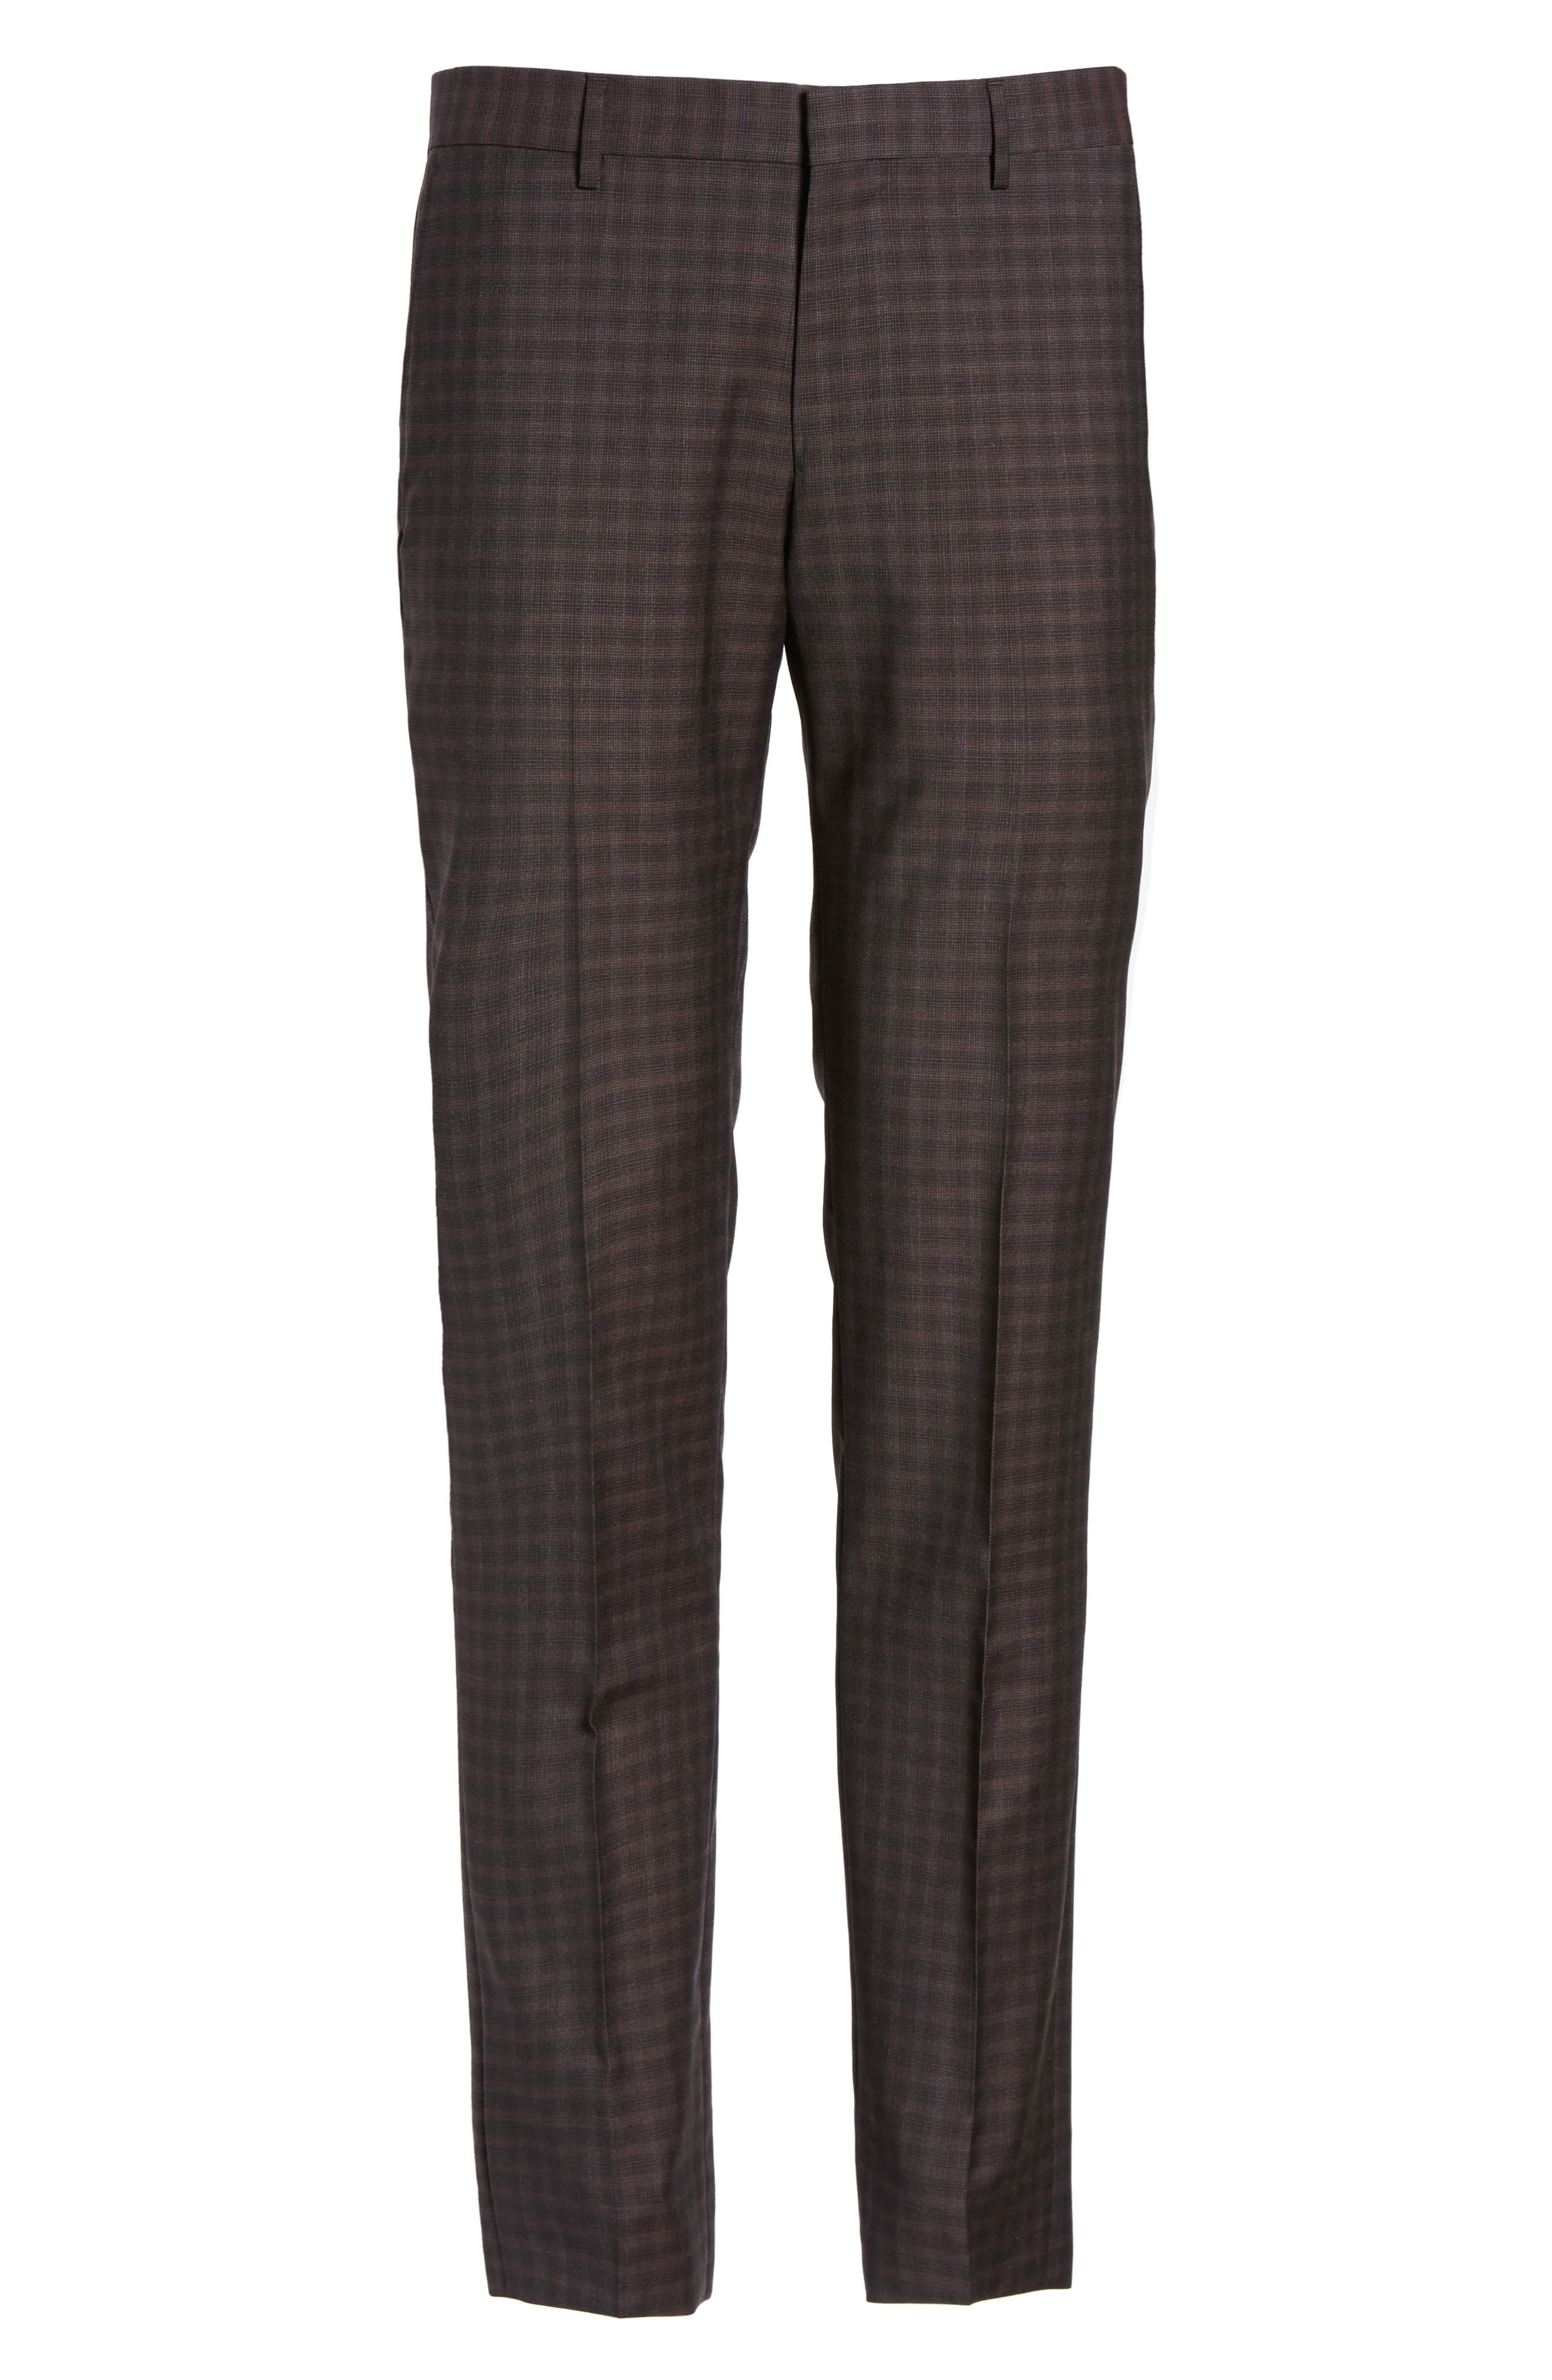 Benso Regular Fit Wool Trousers,                             Alternate thumbnail 6, color,                             Dark Red